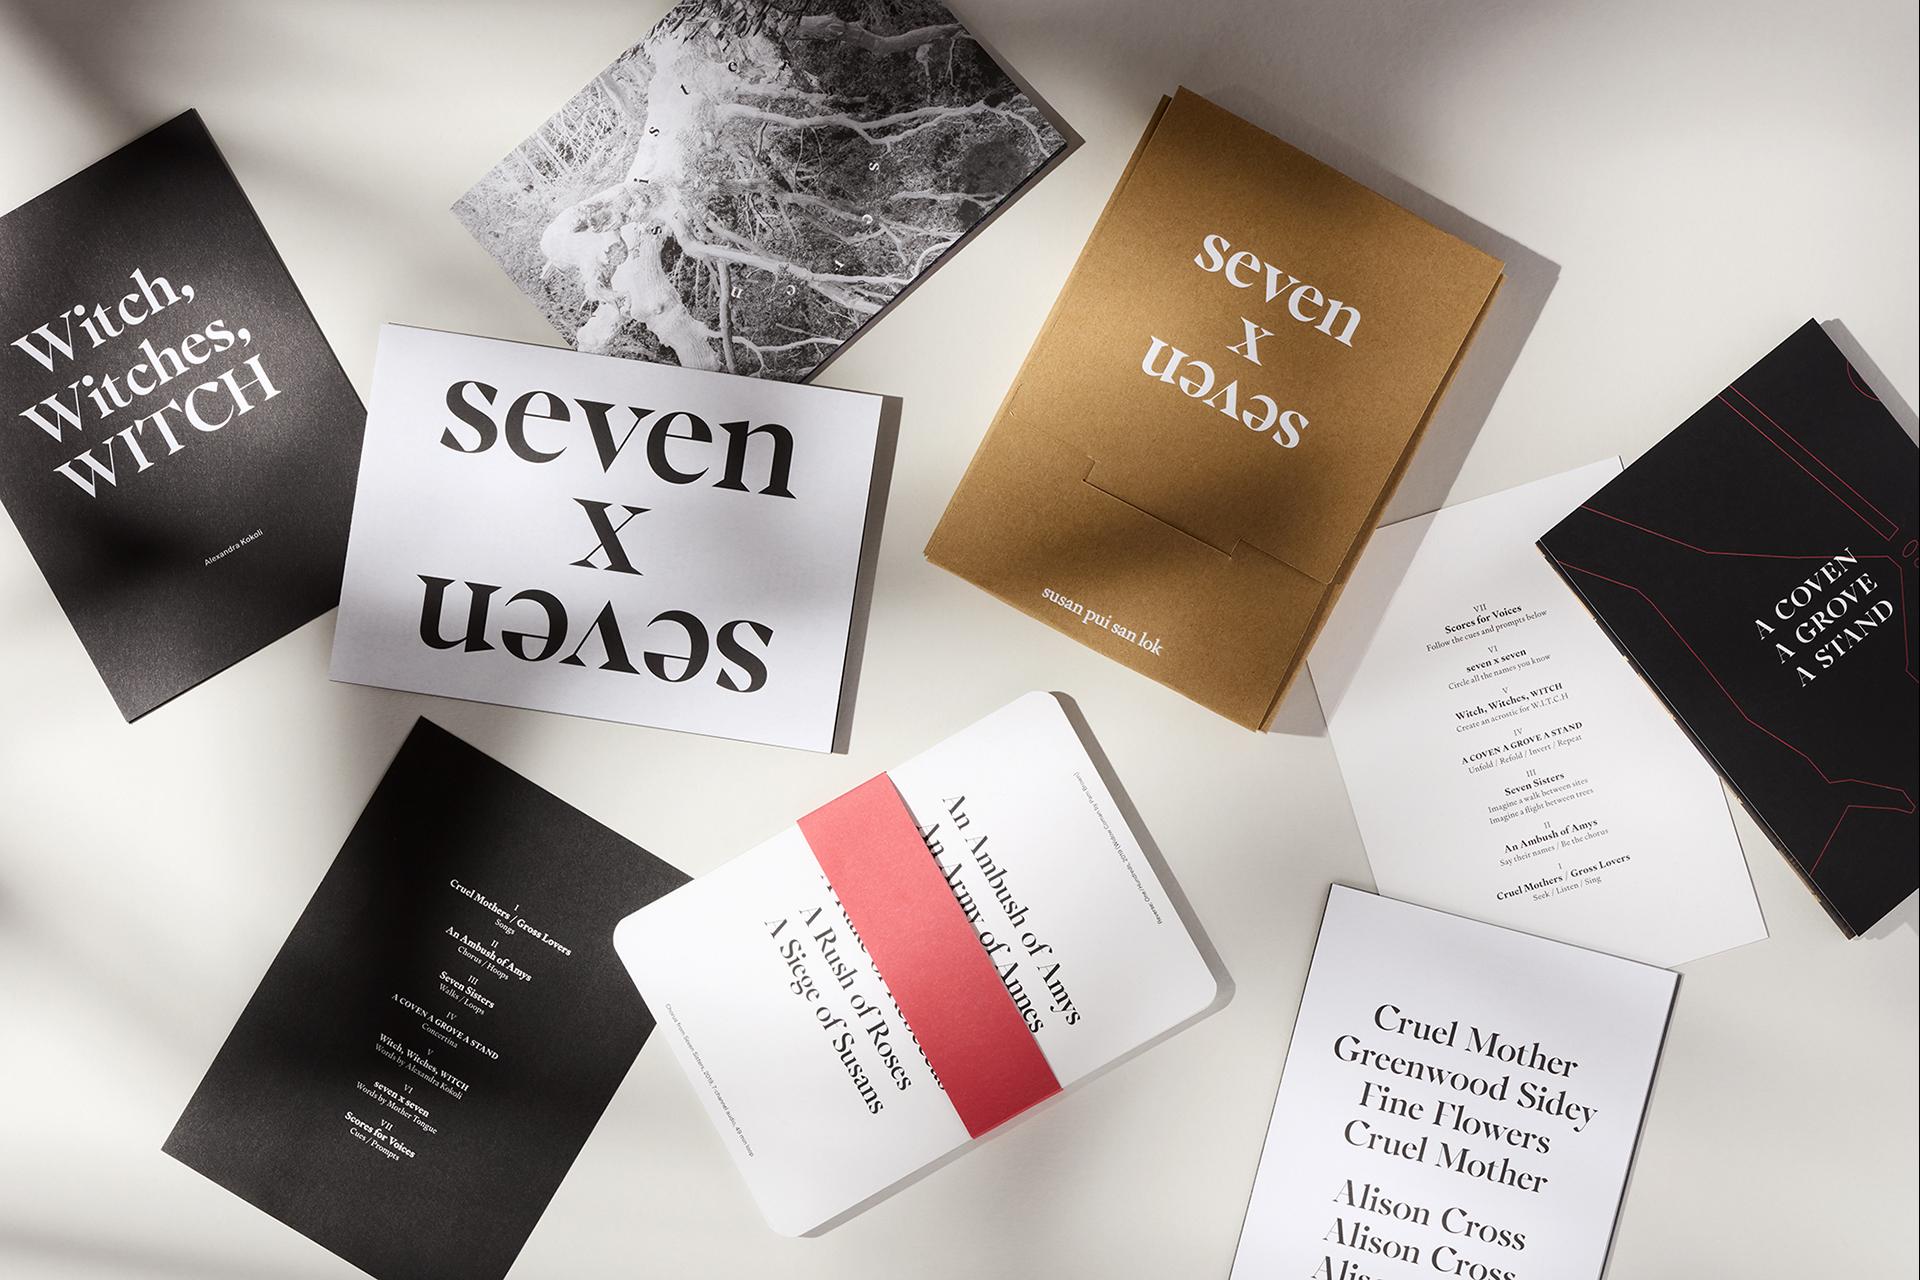 susan pui san lok, 2021, seven x seven, limited edition multiple, various dimensions. Image courtesy of Land of Plenty